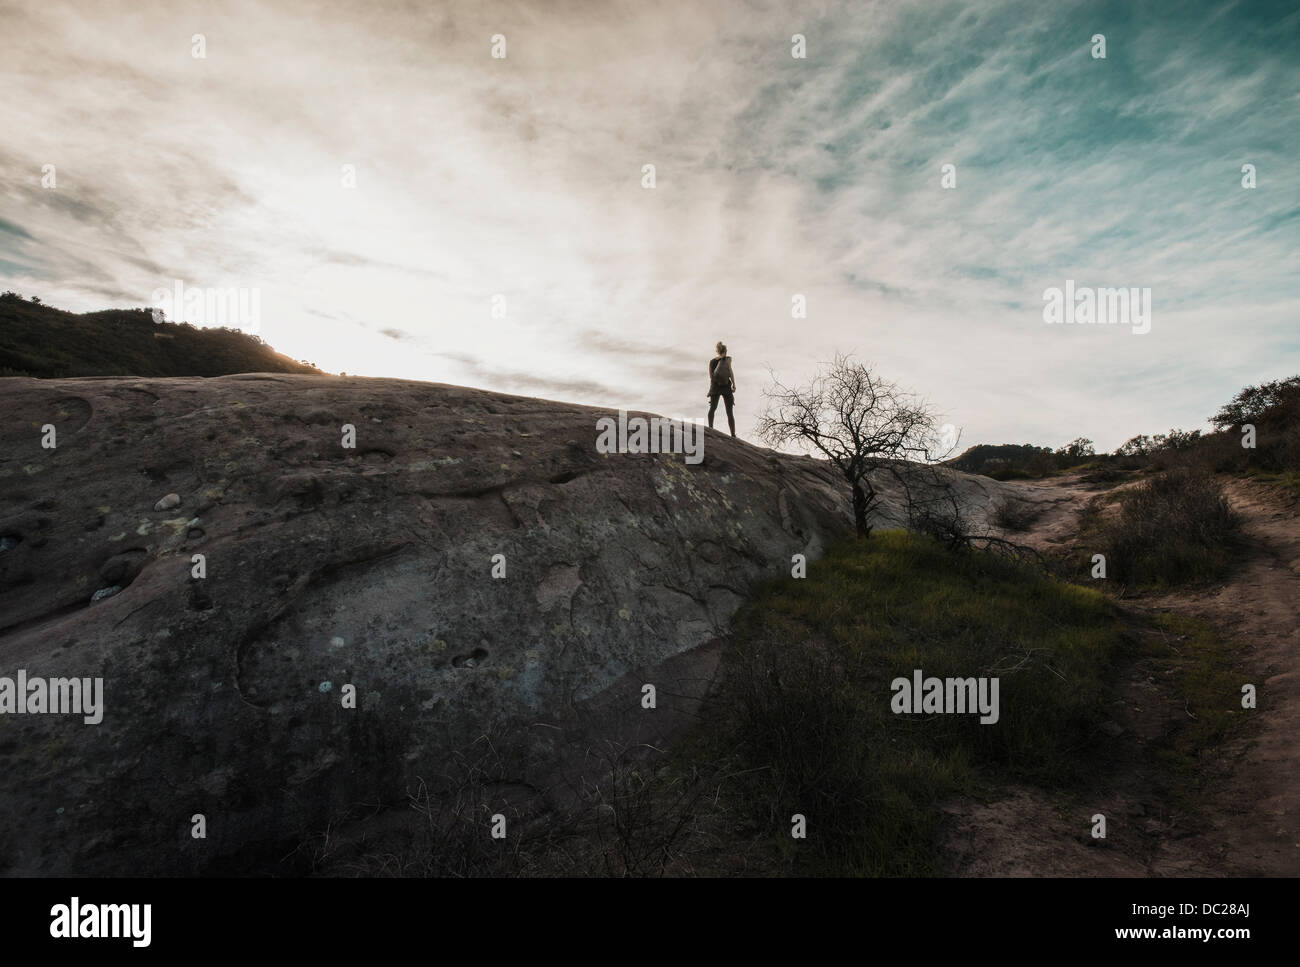 Woman standing on mountain at Topanga, California - Stock Image